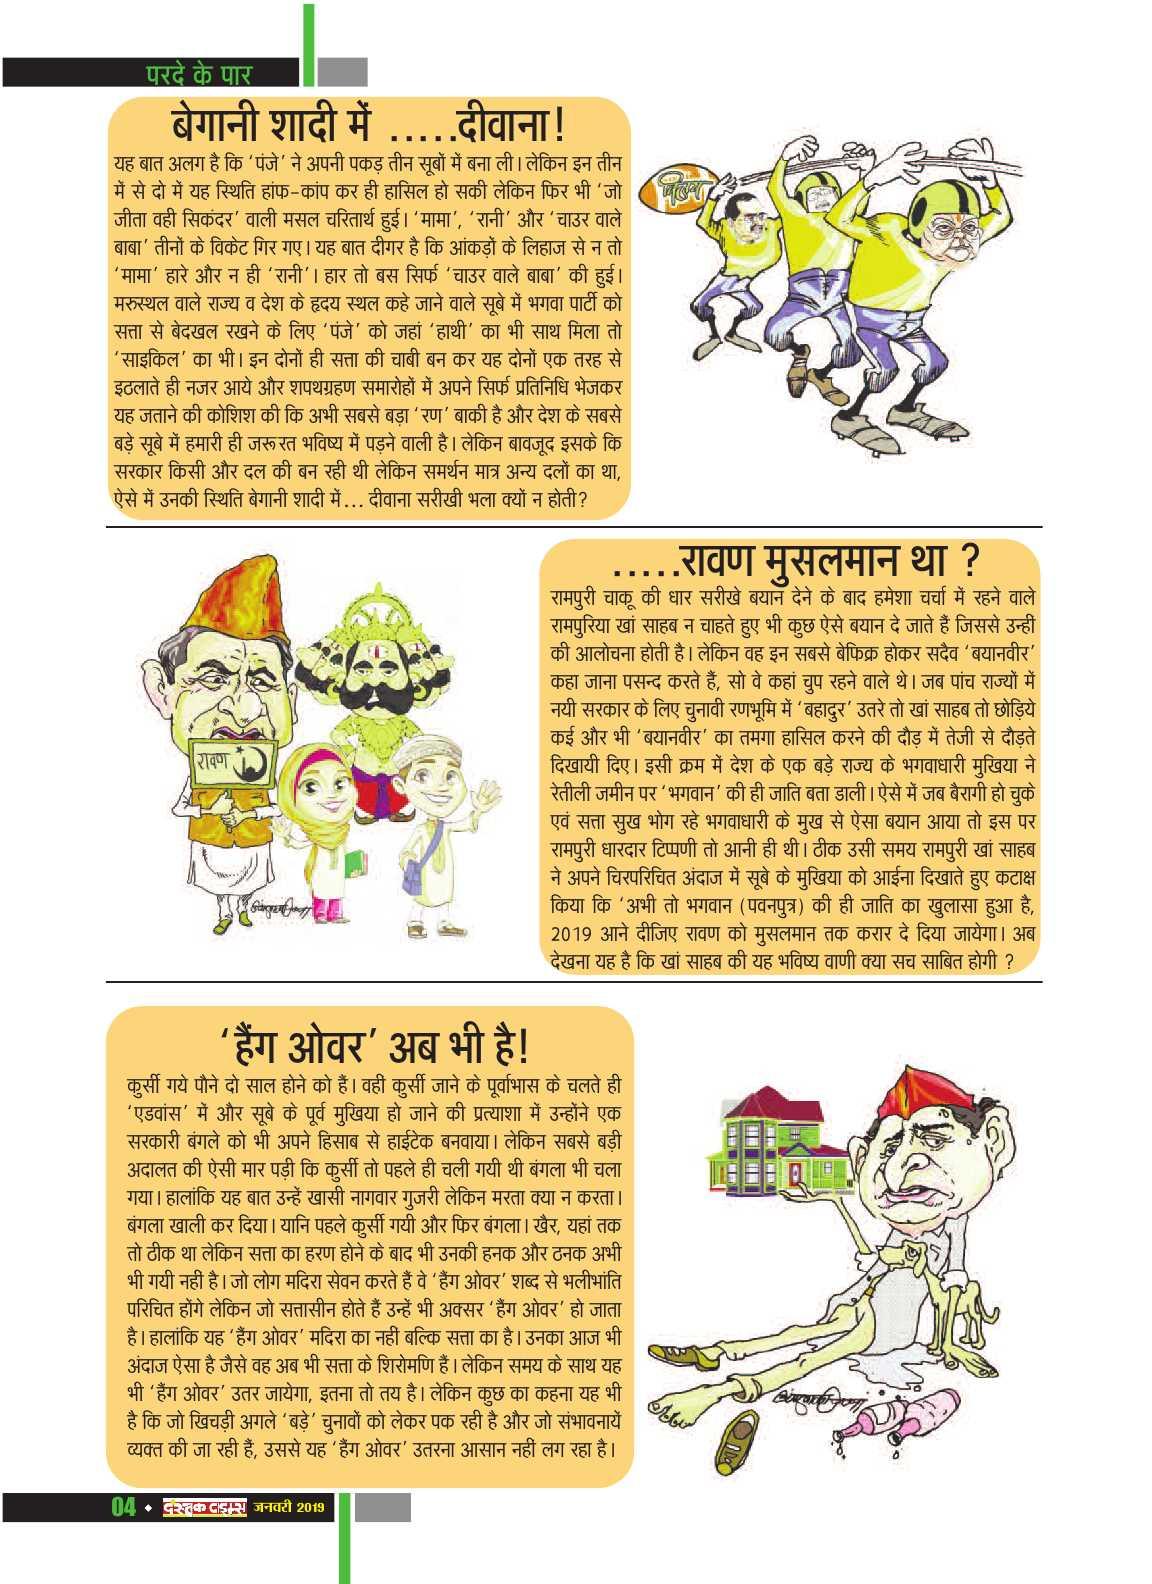 Dastak Times for E-Magazine 15 Jan 2019 new6